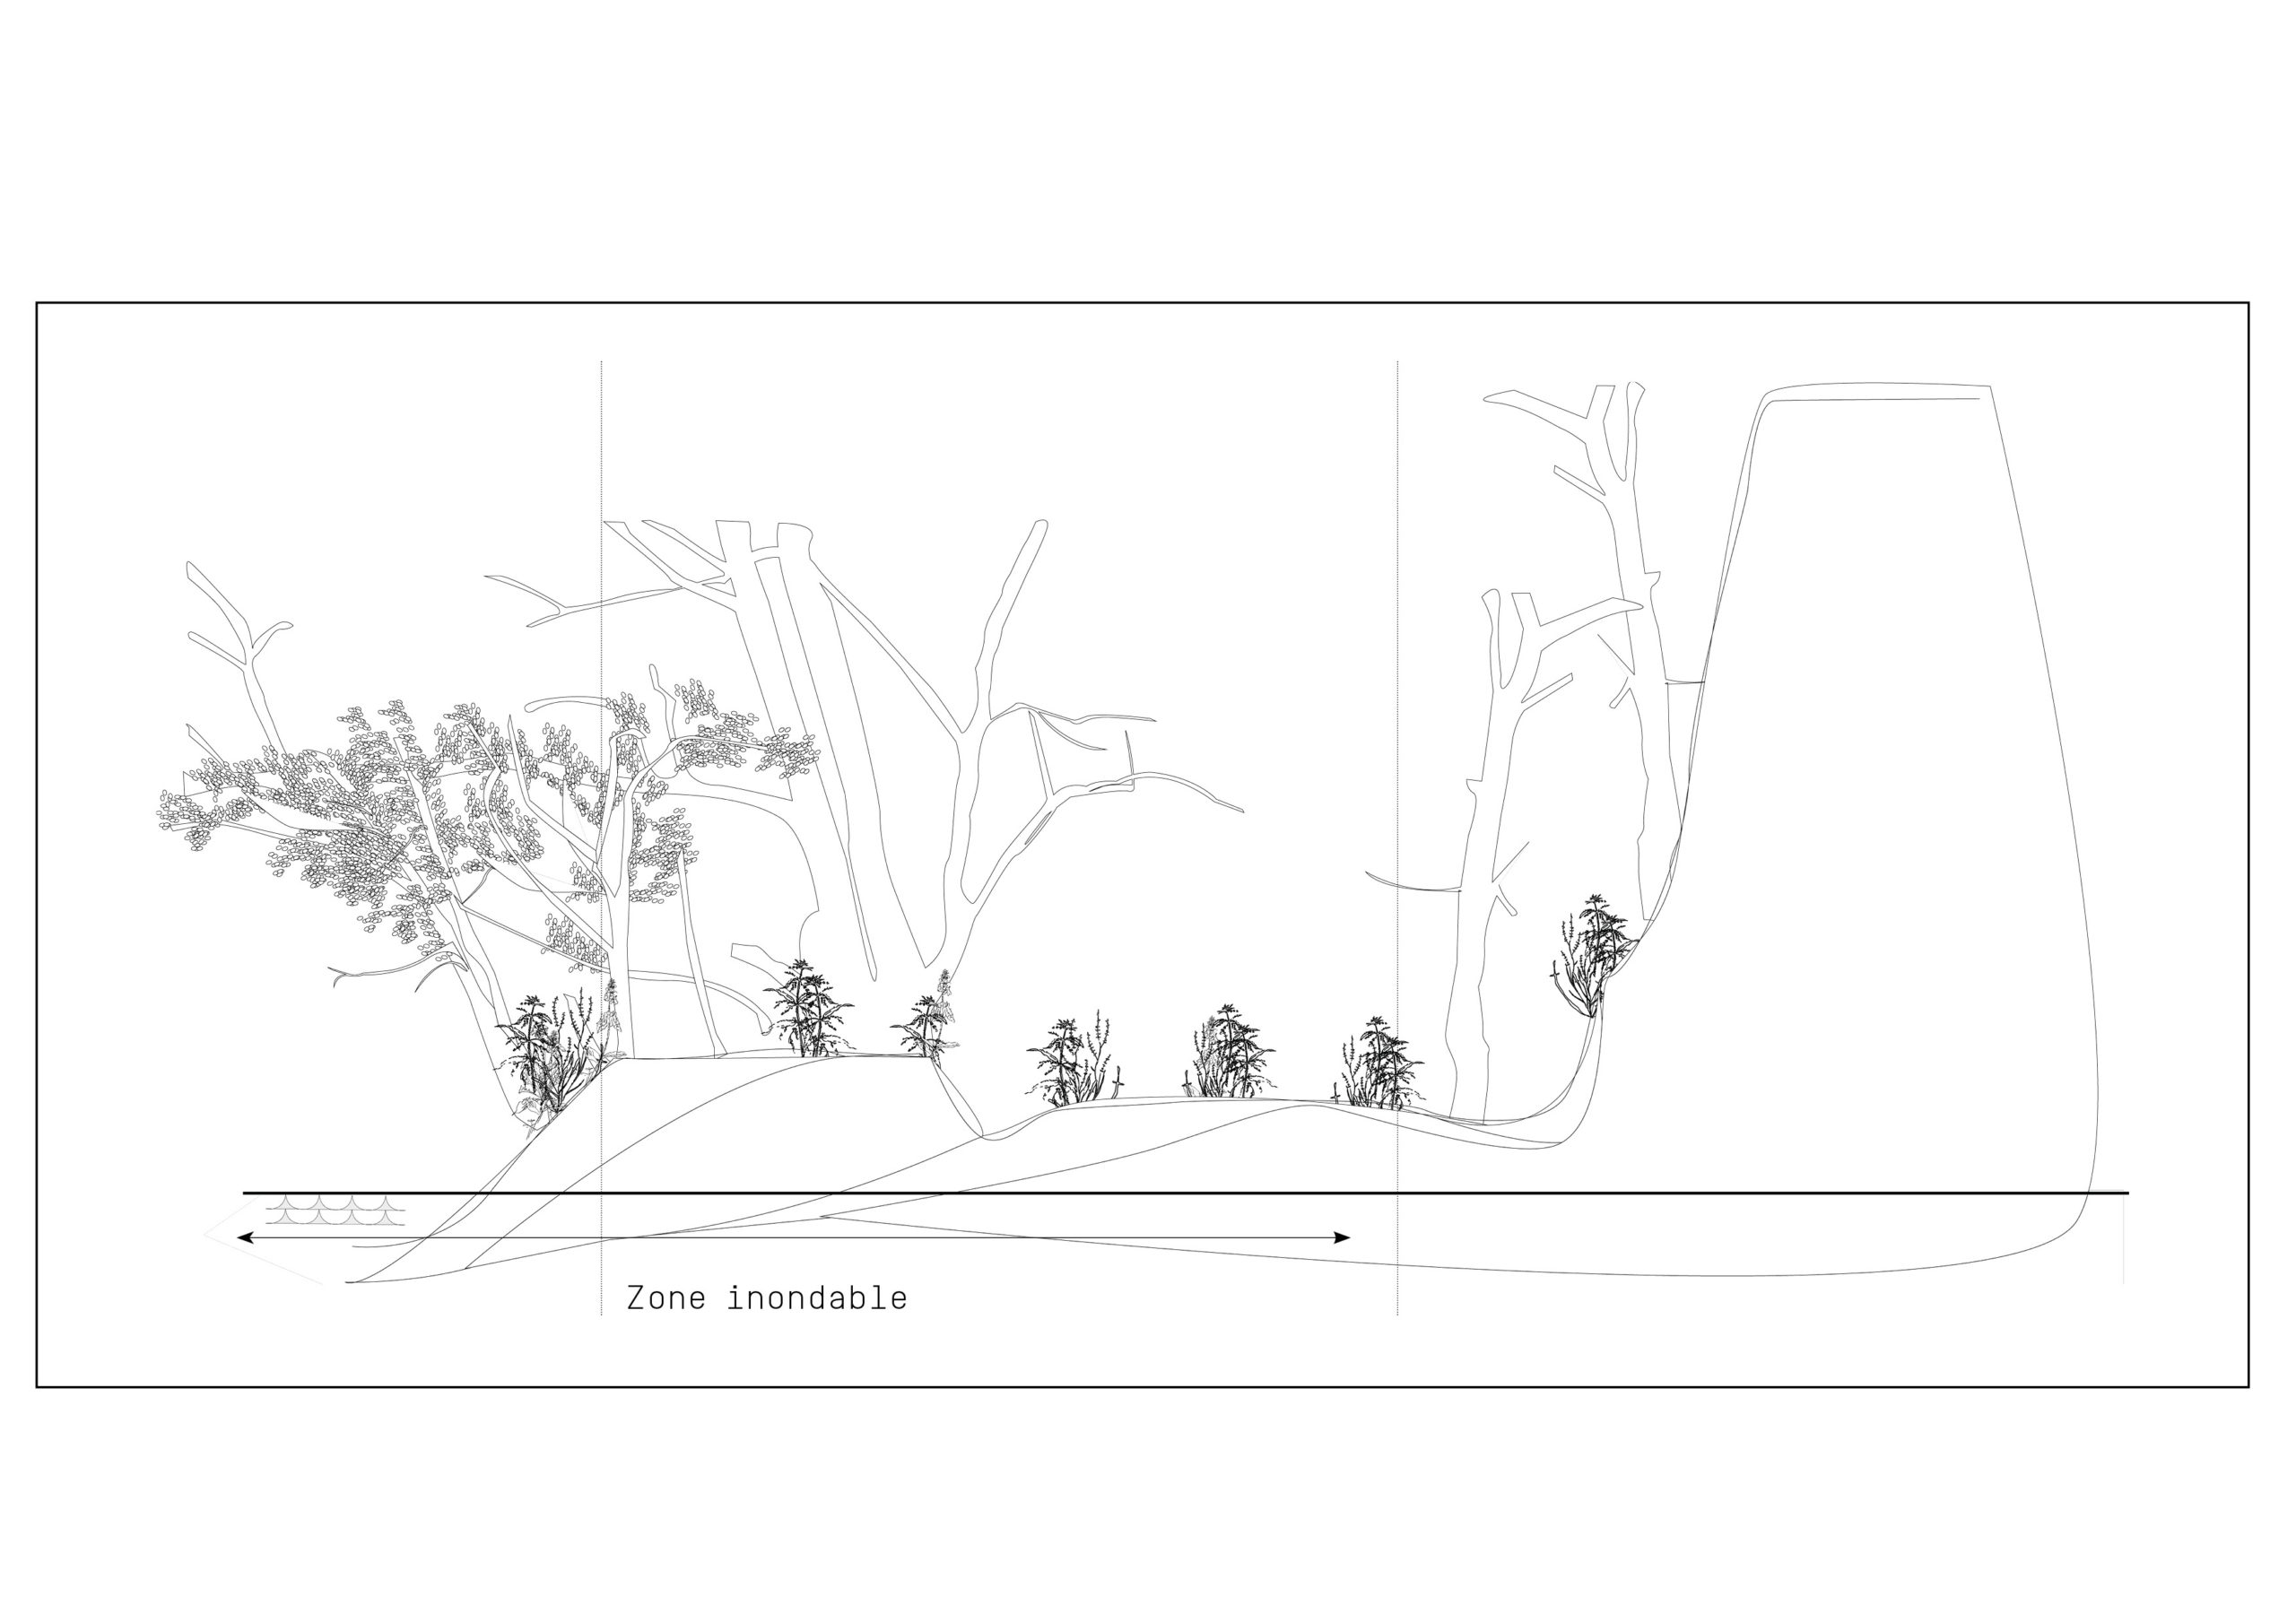 flore de ripisylve